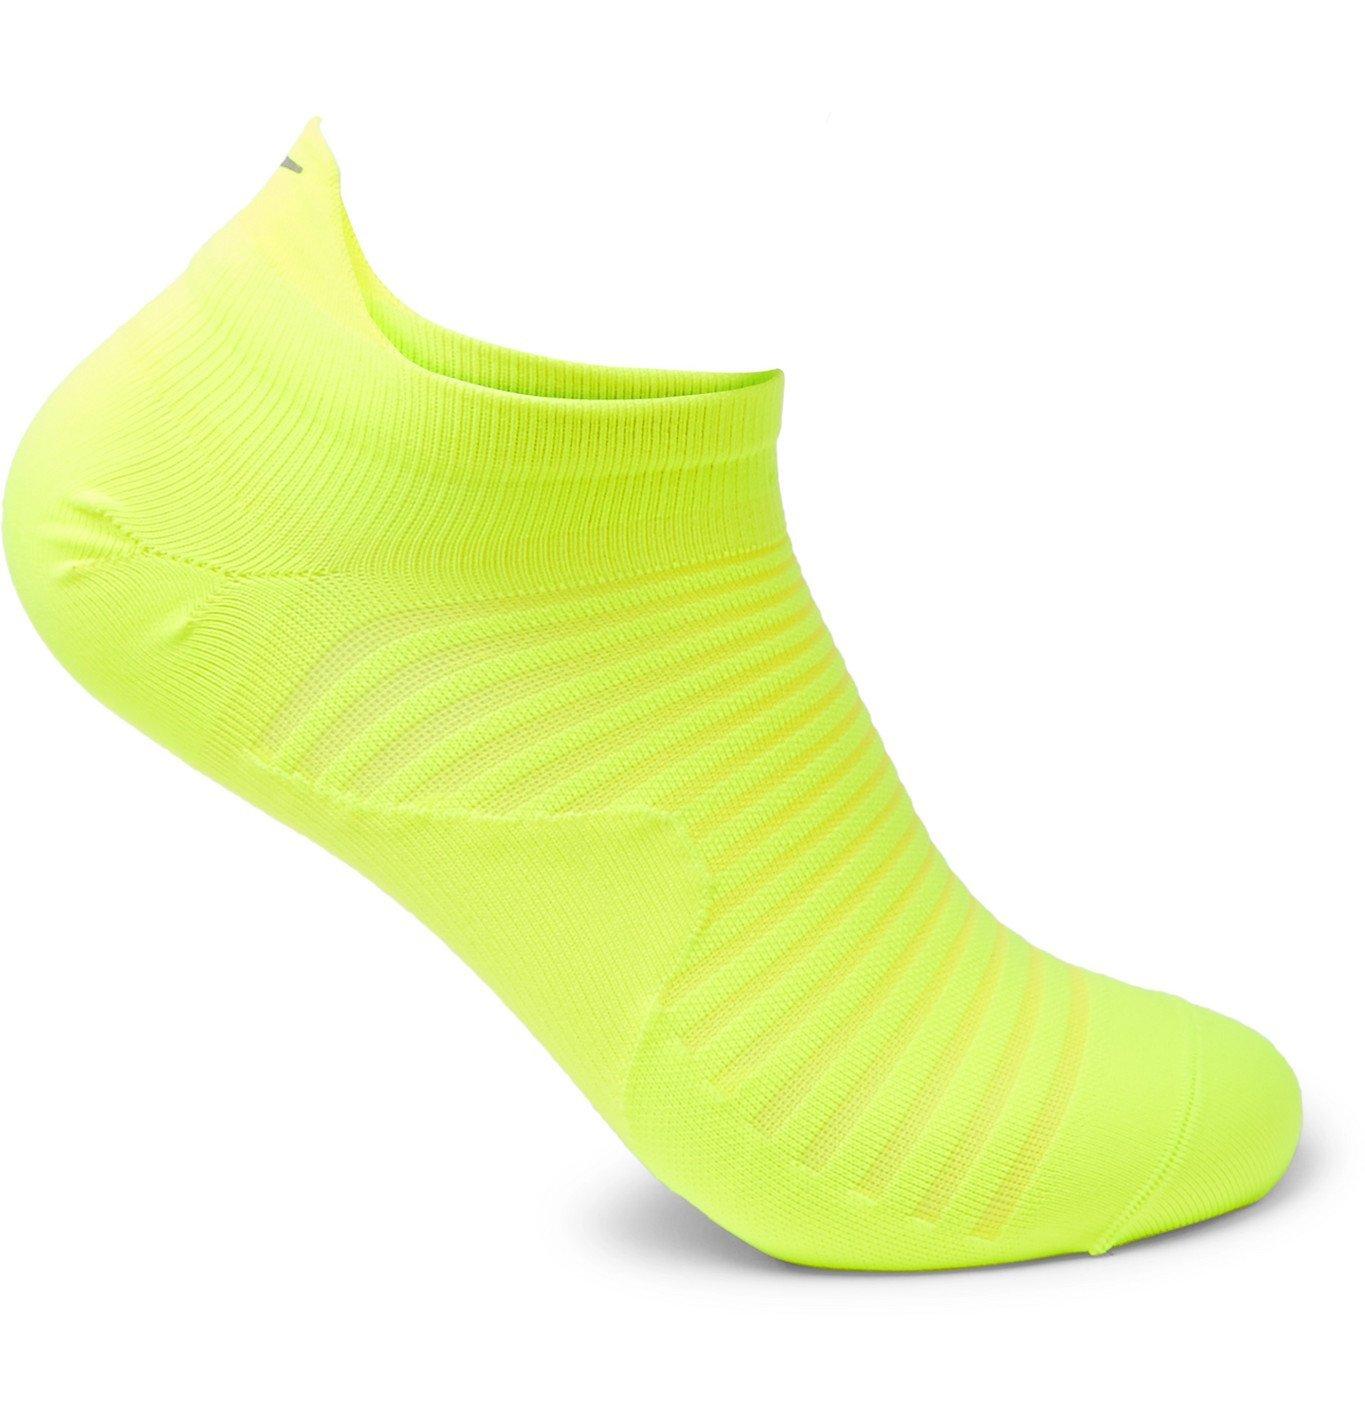 Nike Running - Spark Lightweight Stretch-Knit No-Show Socks - Yellow